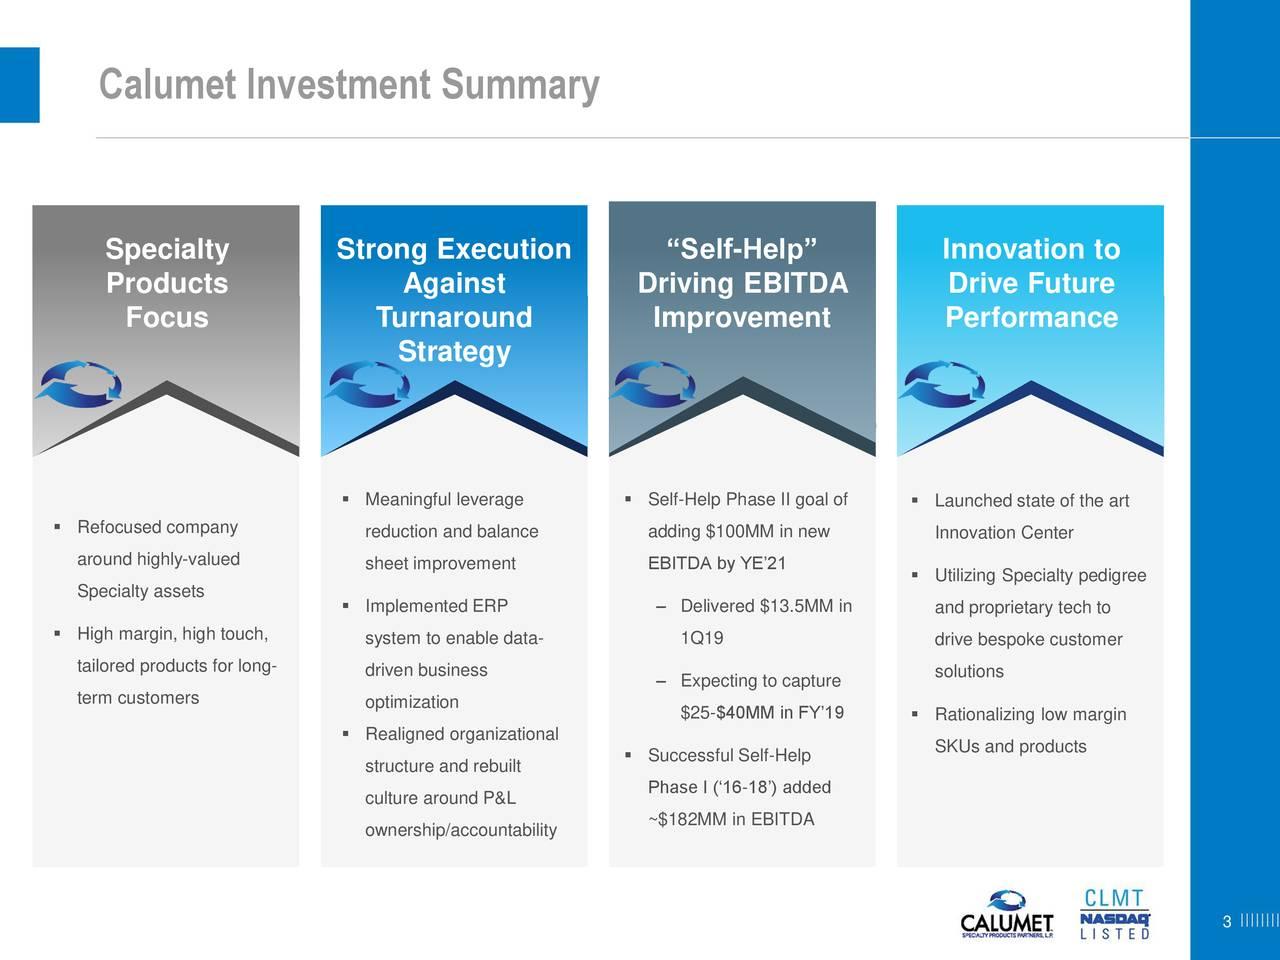 Calumet Investment Summary